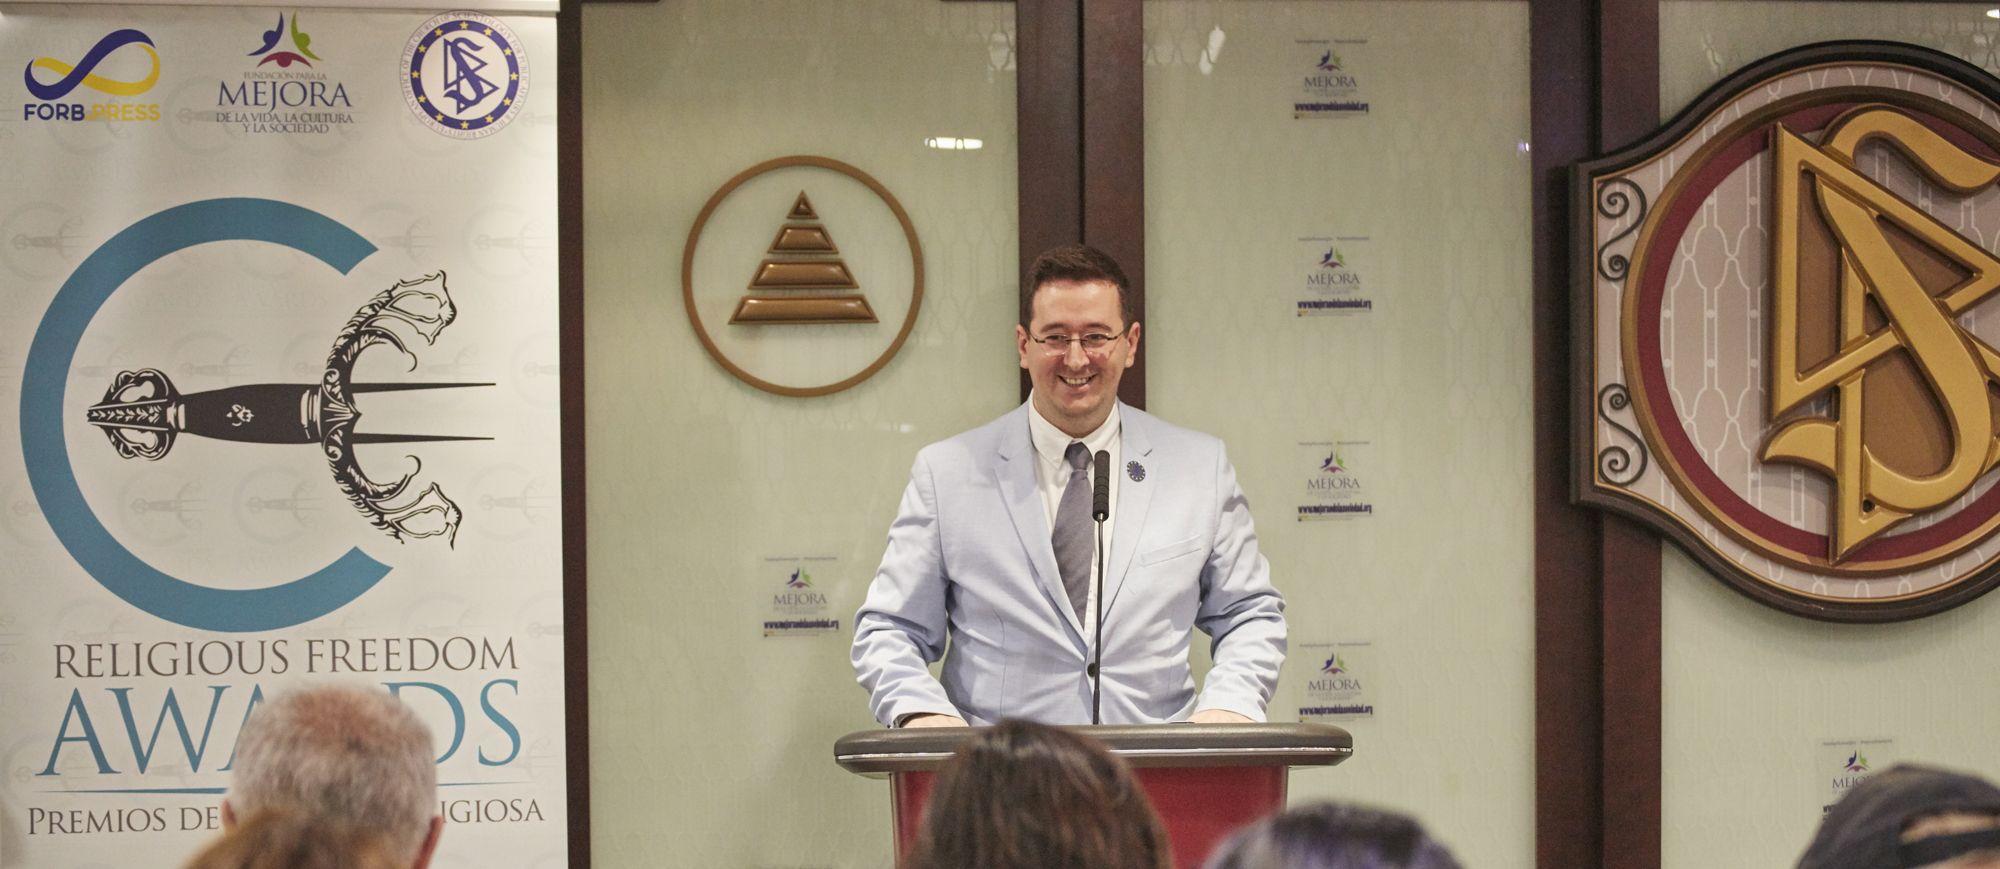 Foto de Ivan Arjona en la entrega de premios